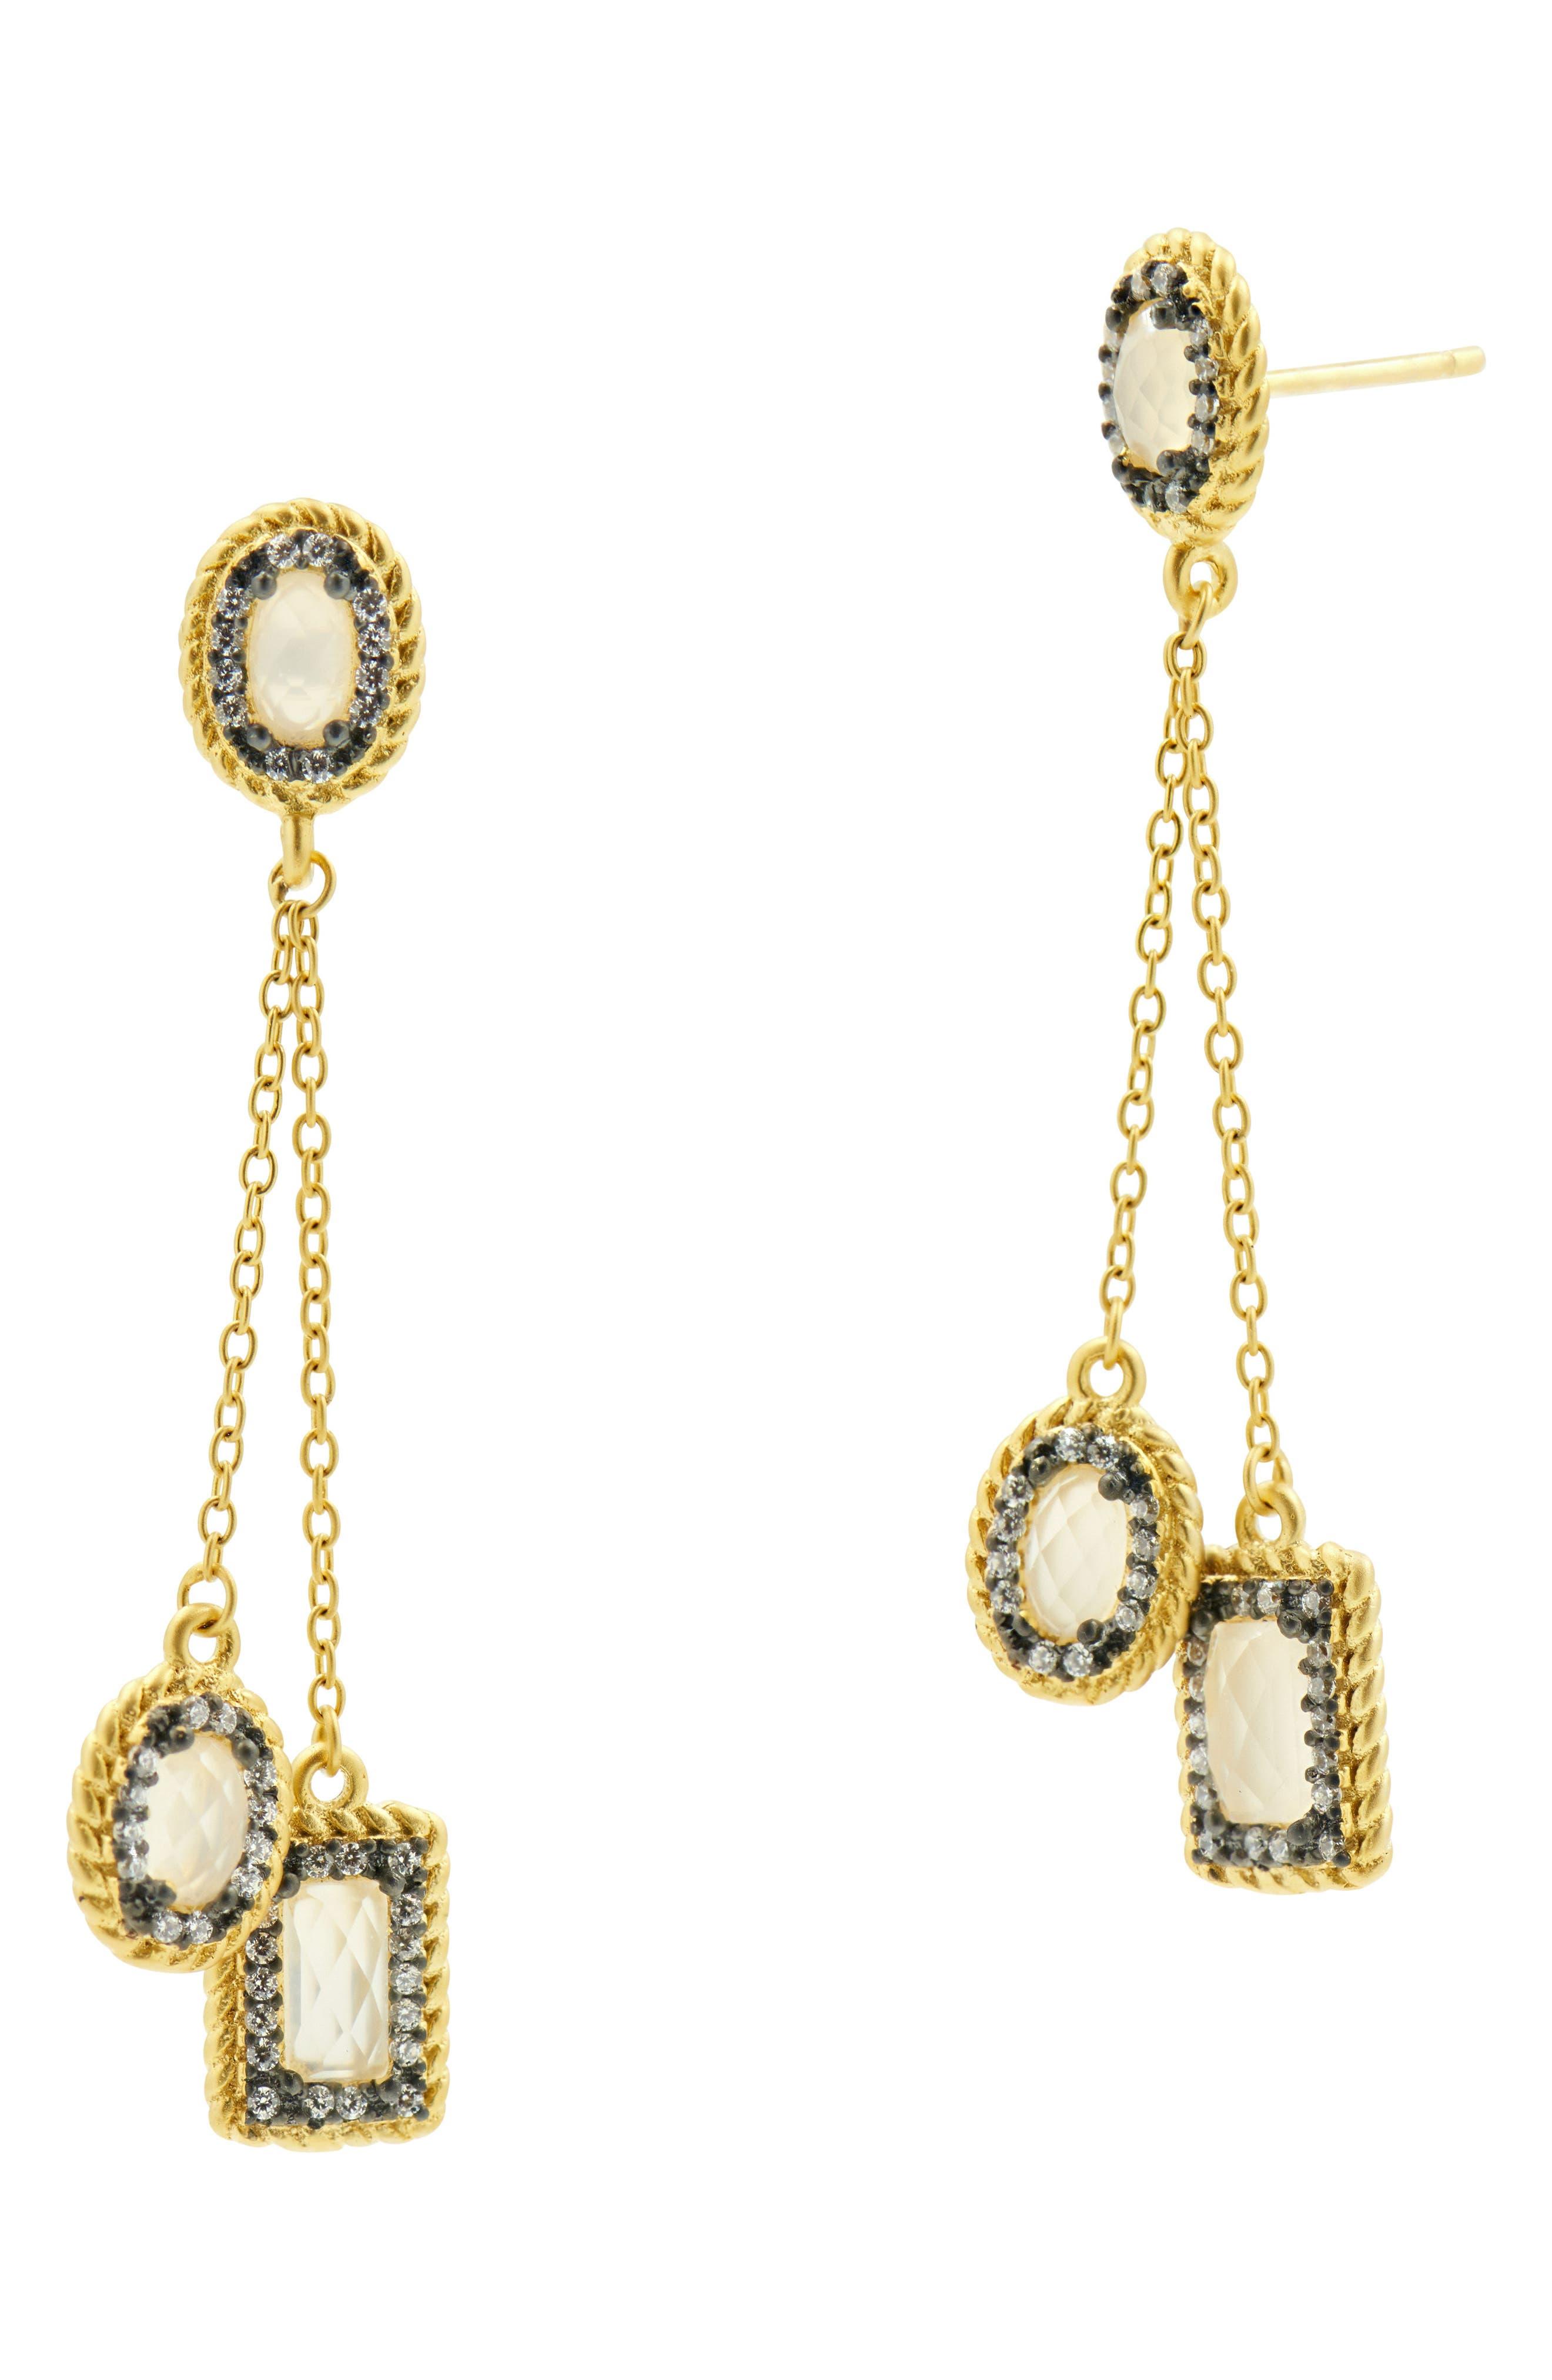 Main Image - FREIDA ROTHMAN Chain Drop Earrings